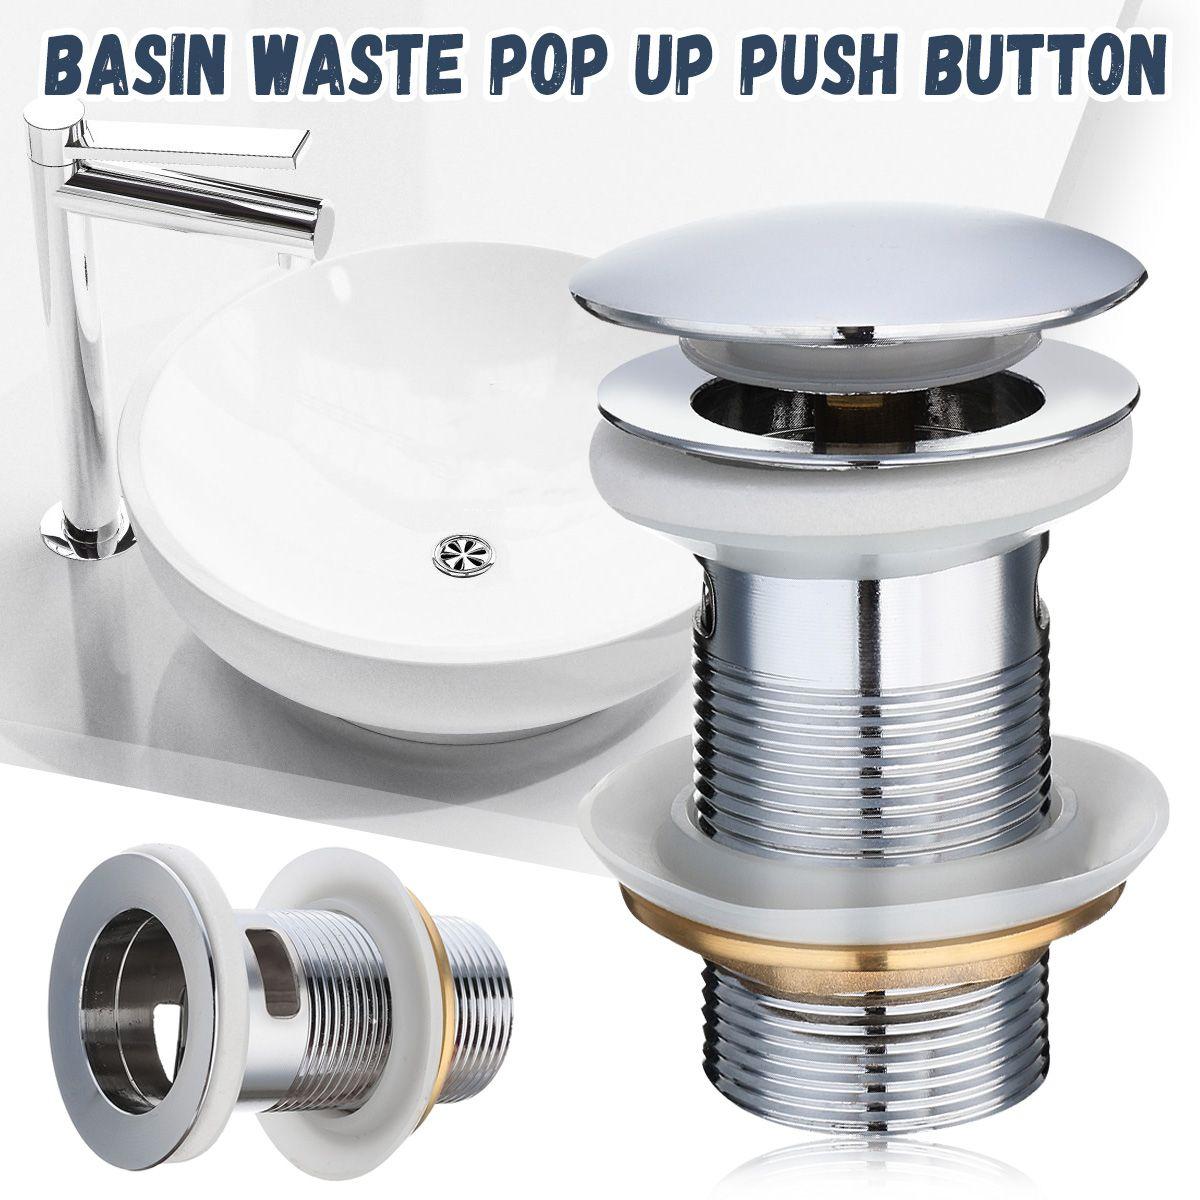 Zinc Alloy Click Slotted Basin Sink Tap Drain Bath Overflow Hole Push Button Pops Up Clack Waste Plug